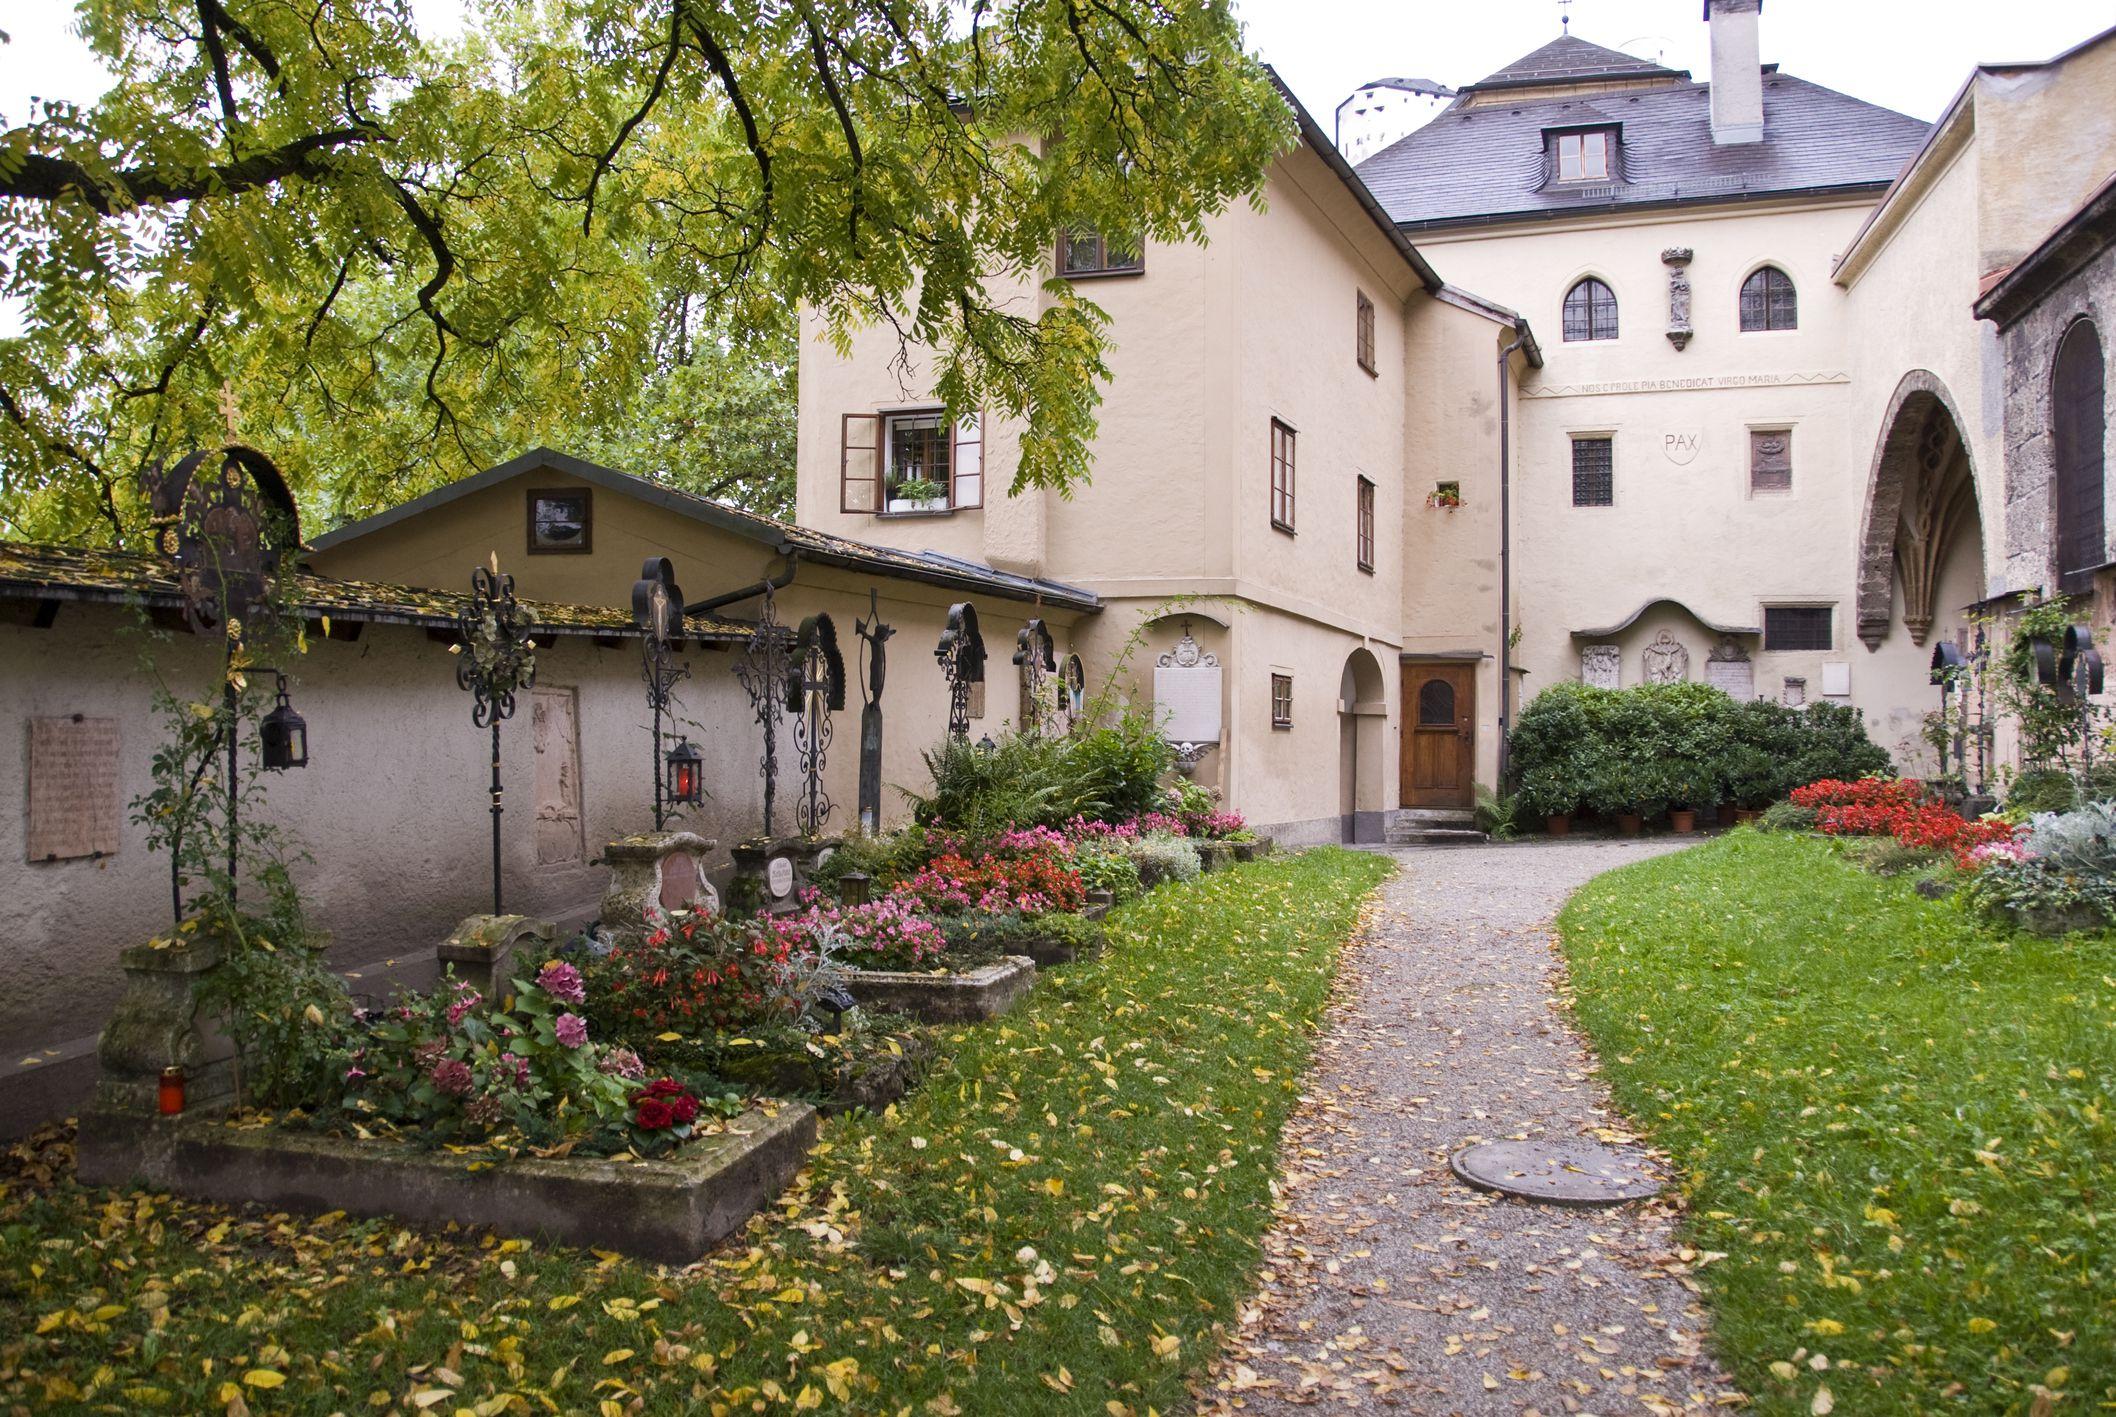 Cemetery at Nonnberg Abbey, Salzburg